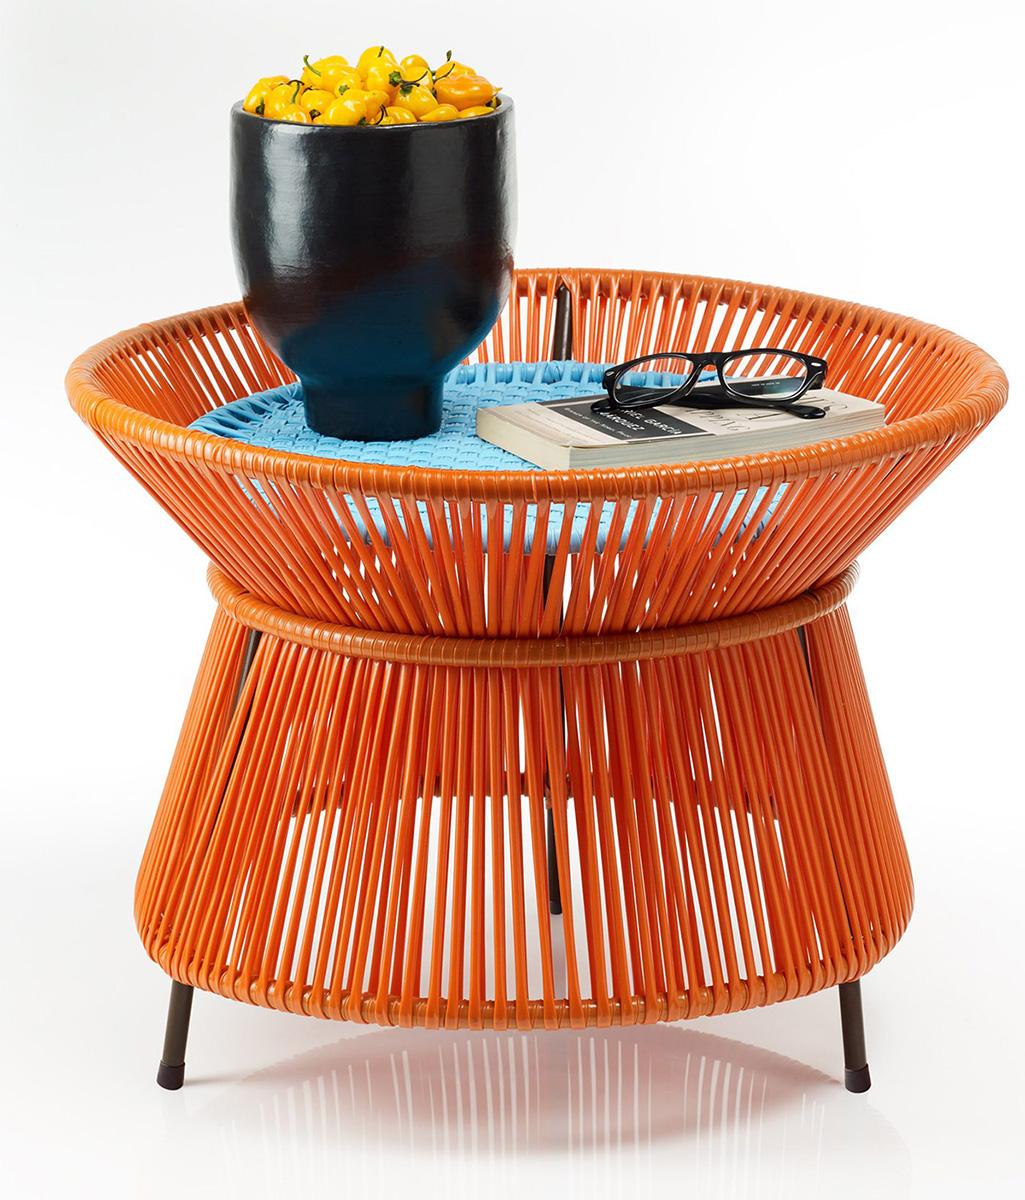 ambientes caribe por sebastian herkner y ames design. Black Bedroom Furniture Sets. Home Design Ideas